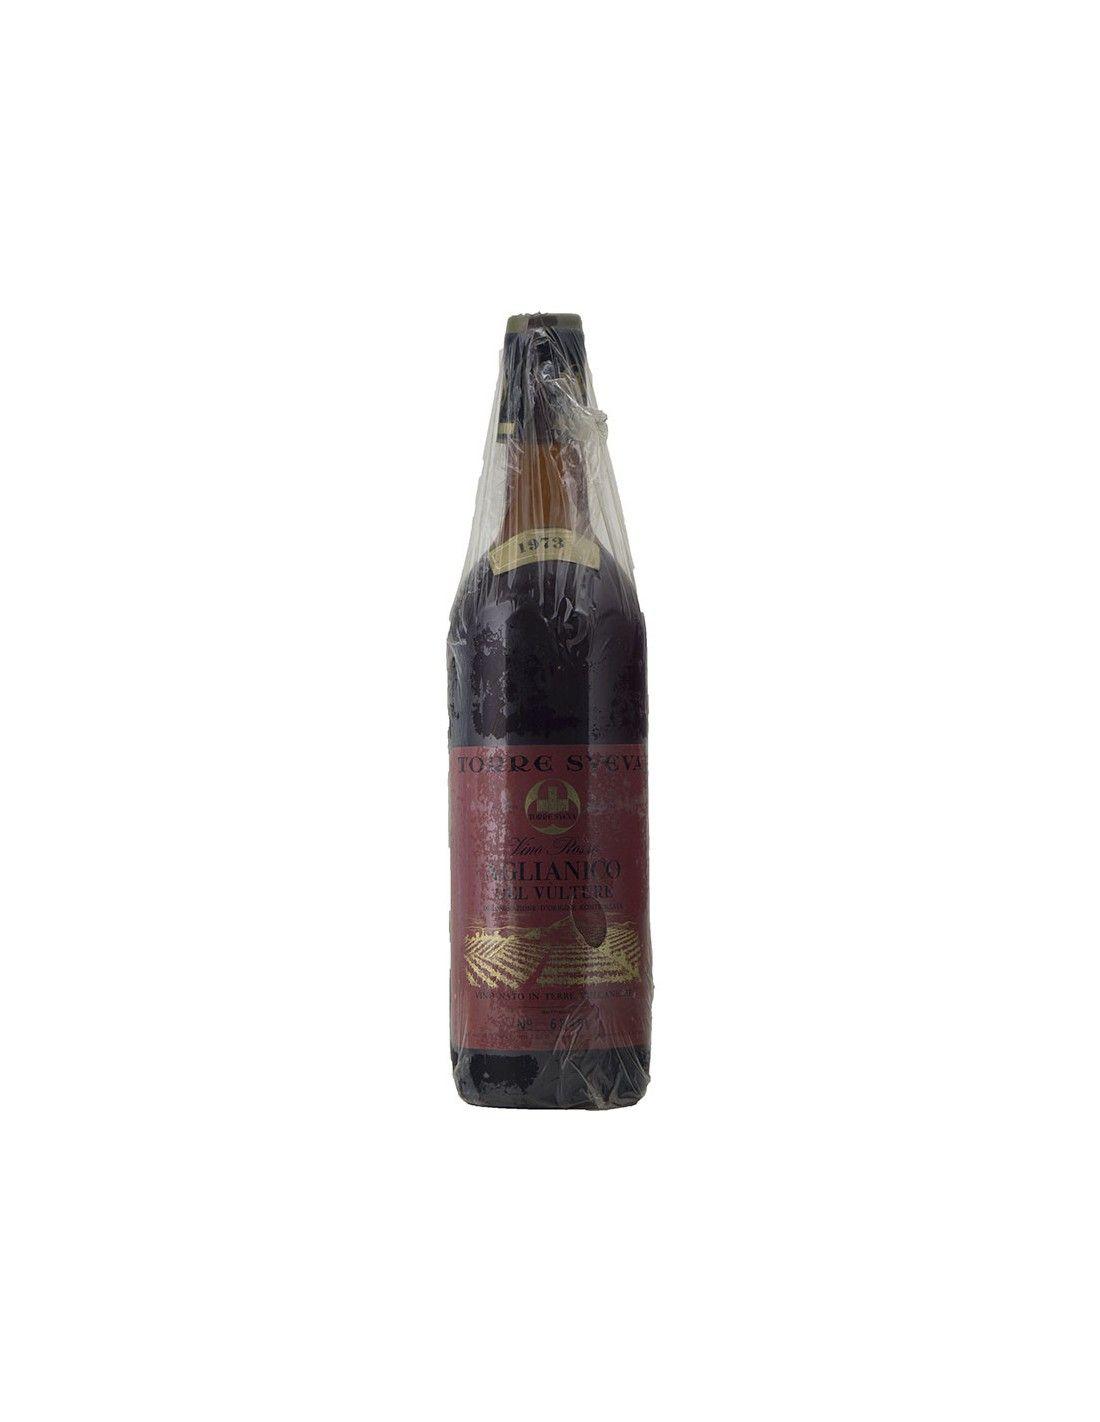 AGLIANICO DEL VULTURE 1973 TORRE SVEVA Grandi Bottiglie